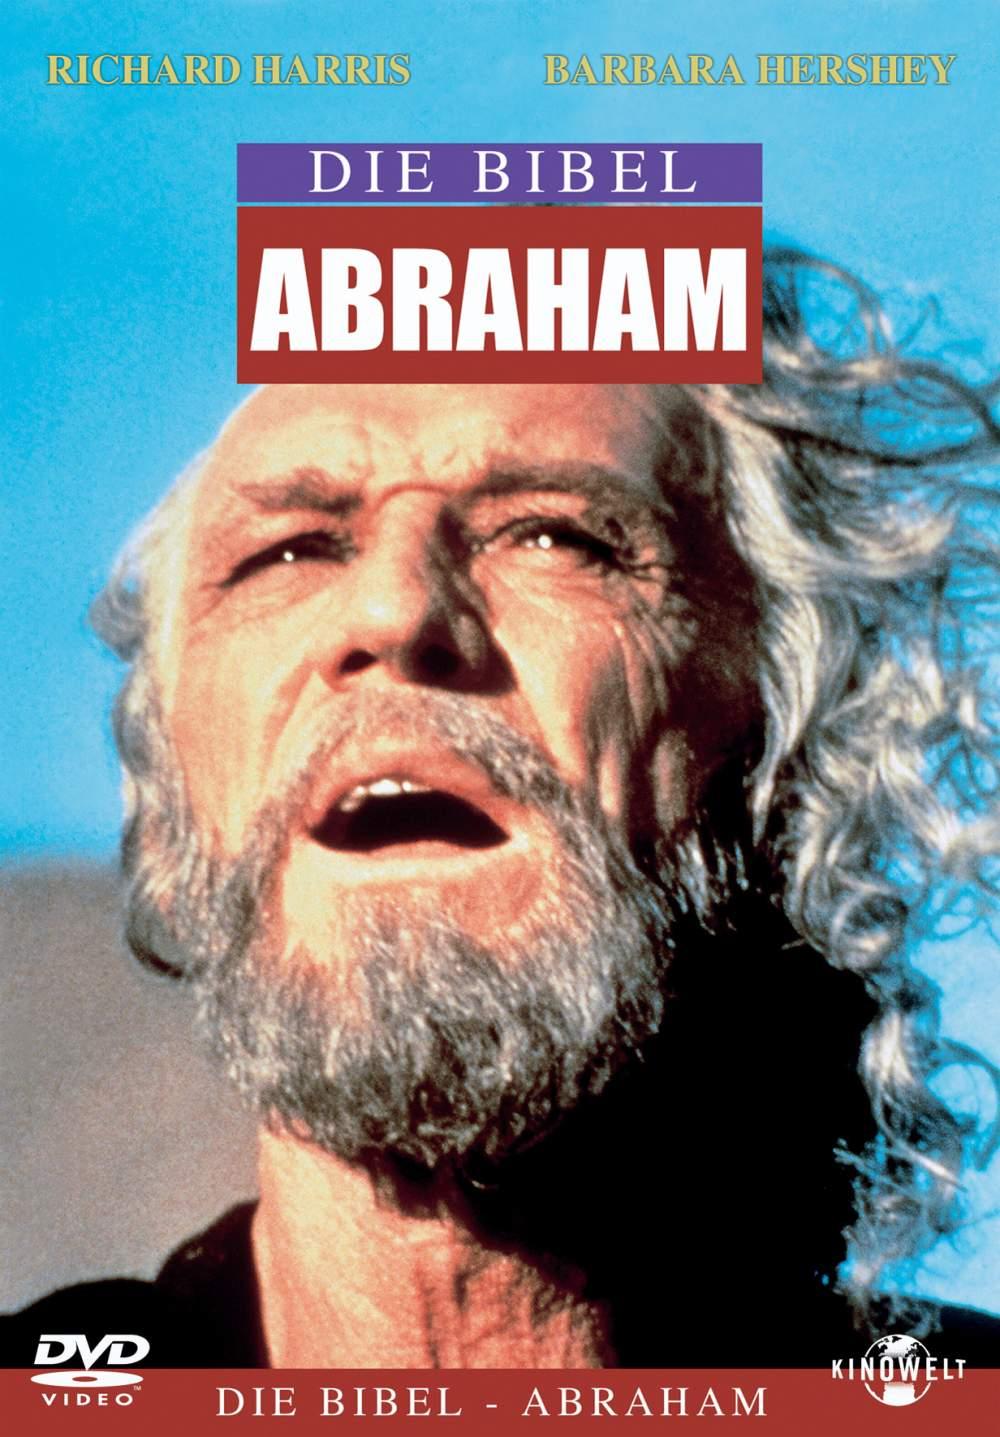 Die Bibel - Abraham - Film